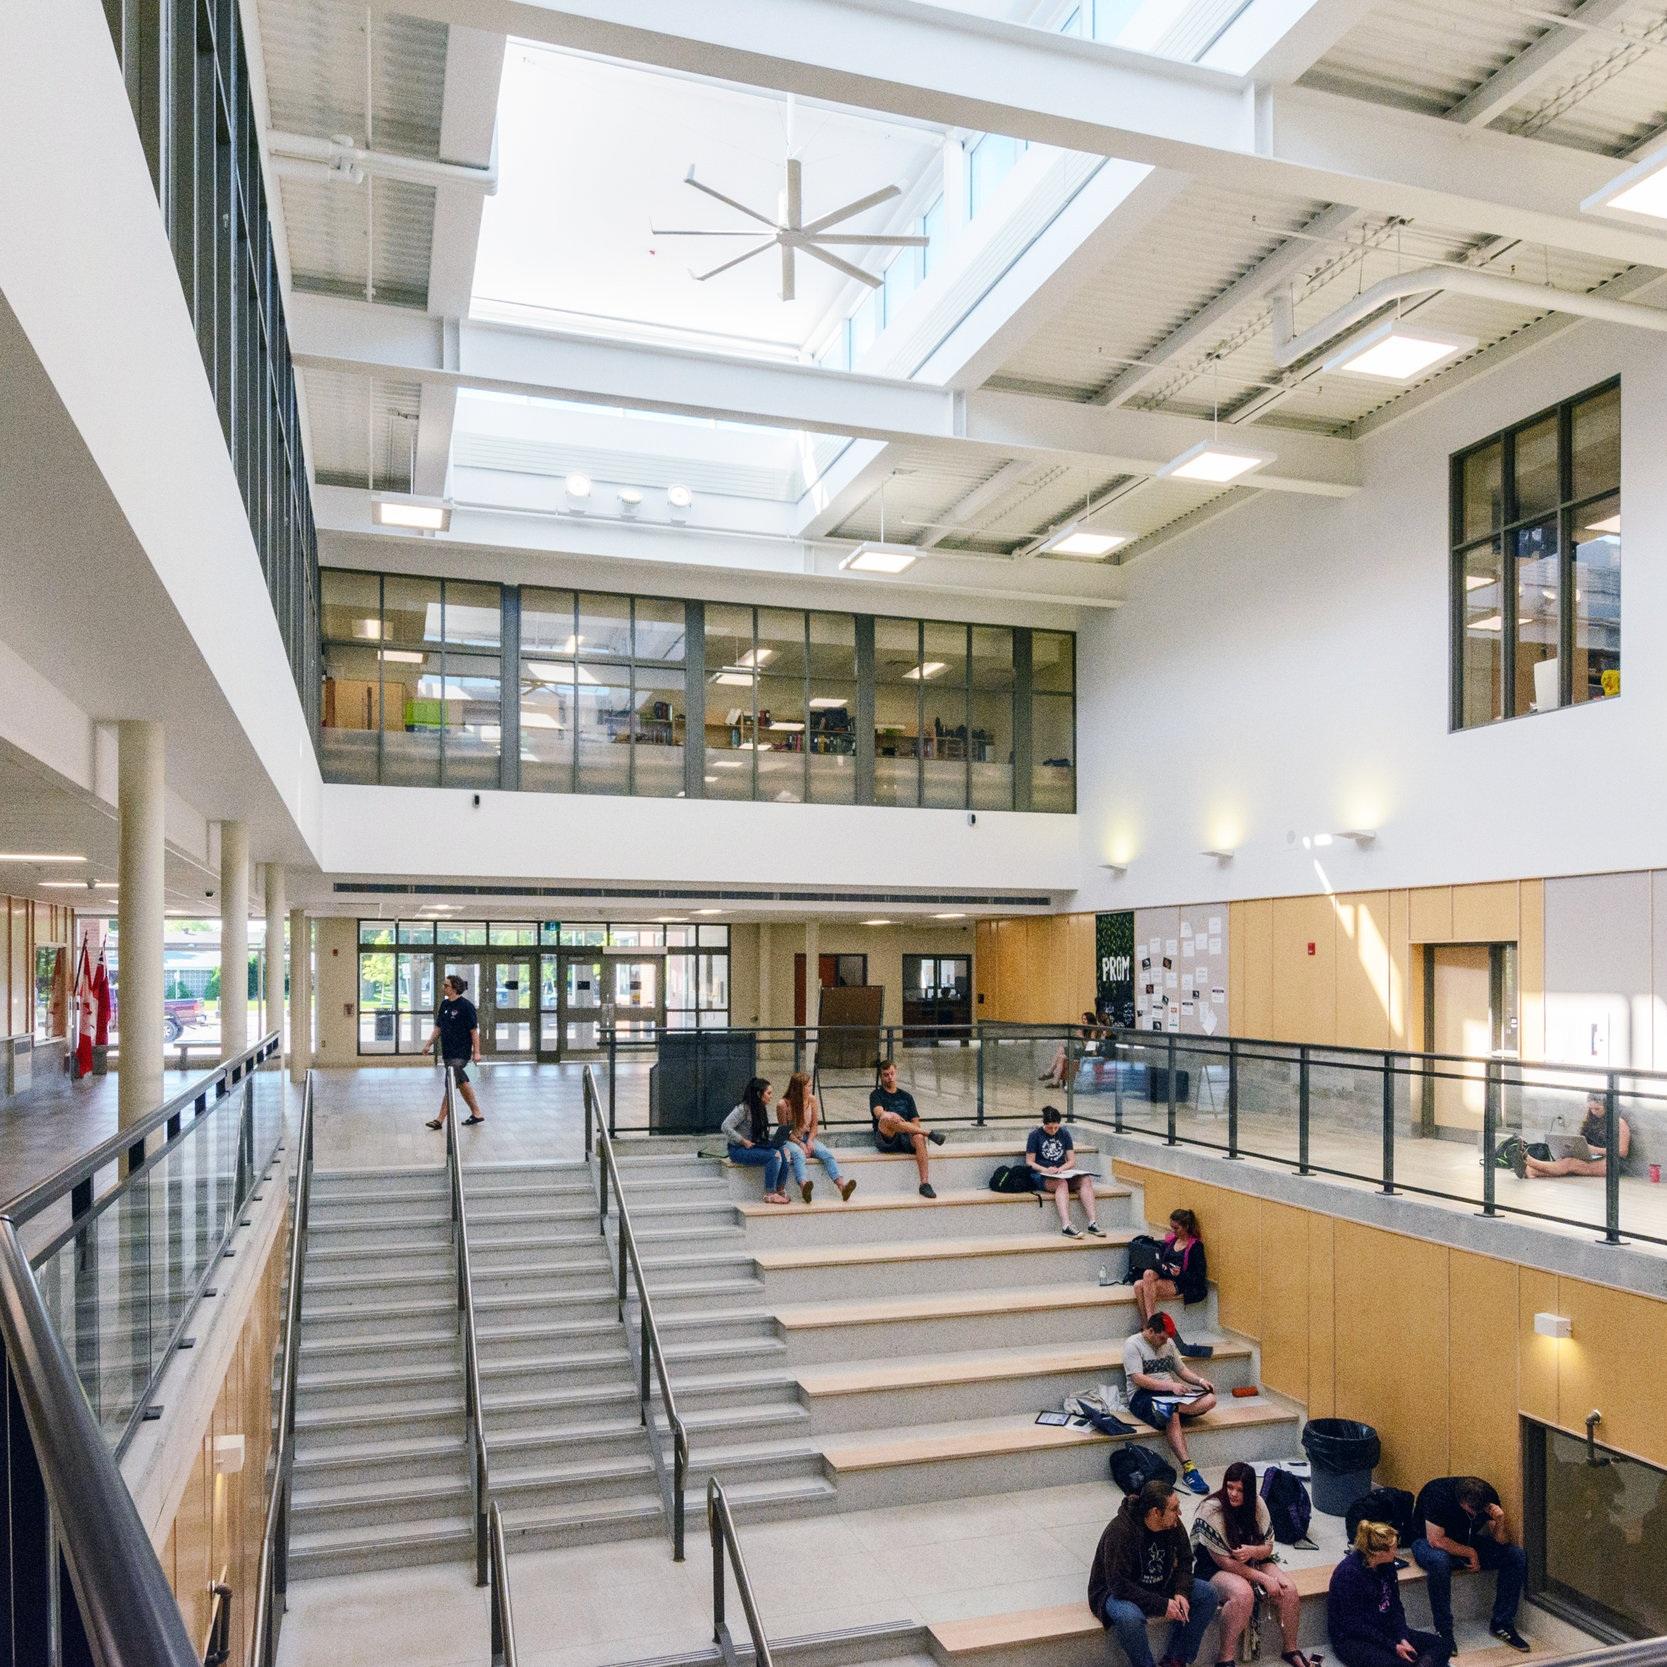 Orillia Secondary School, Orillia, ON, Architect, Moffet & Duncan Architects, 2016